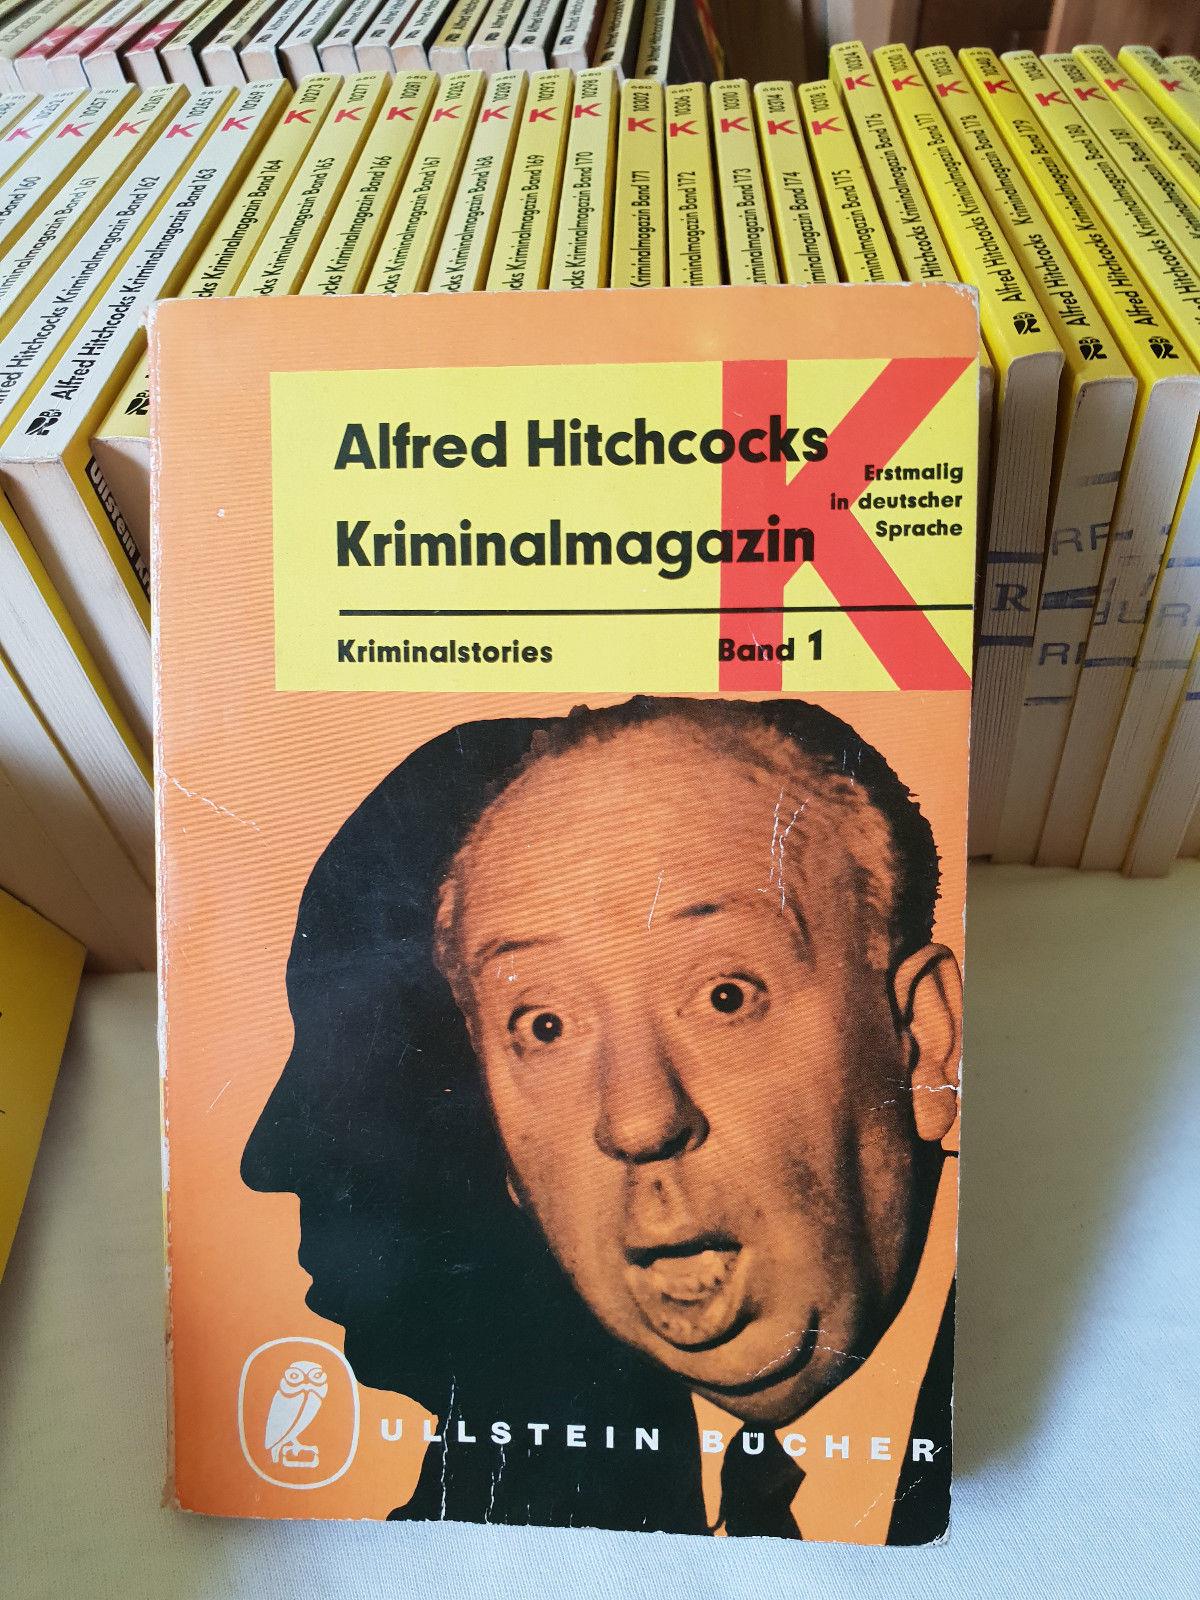 Ullstein Verlag - Alfred Hitchcock´s Kriminalmagazin 188 Stück